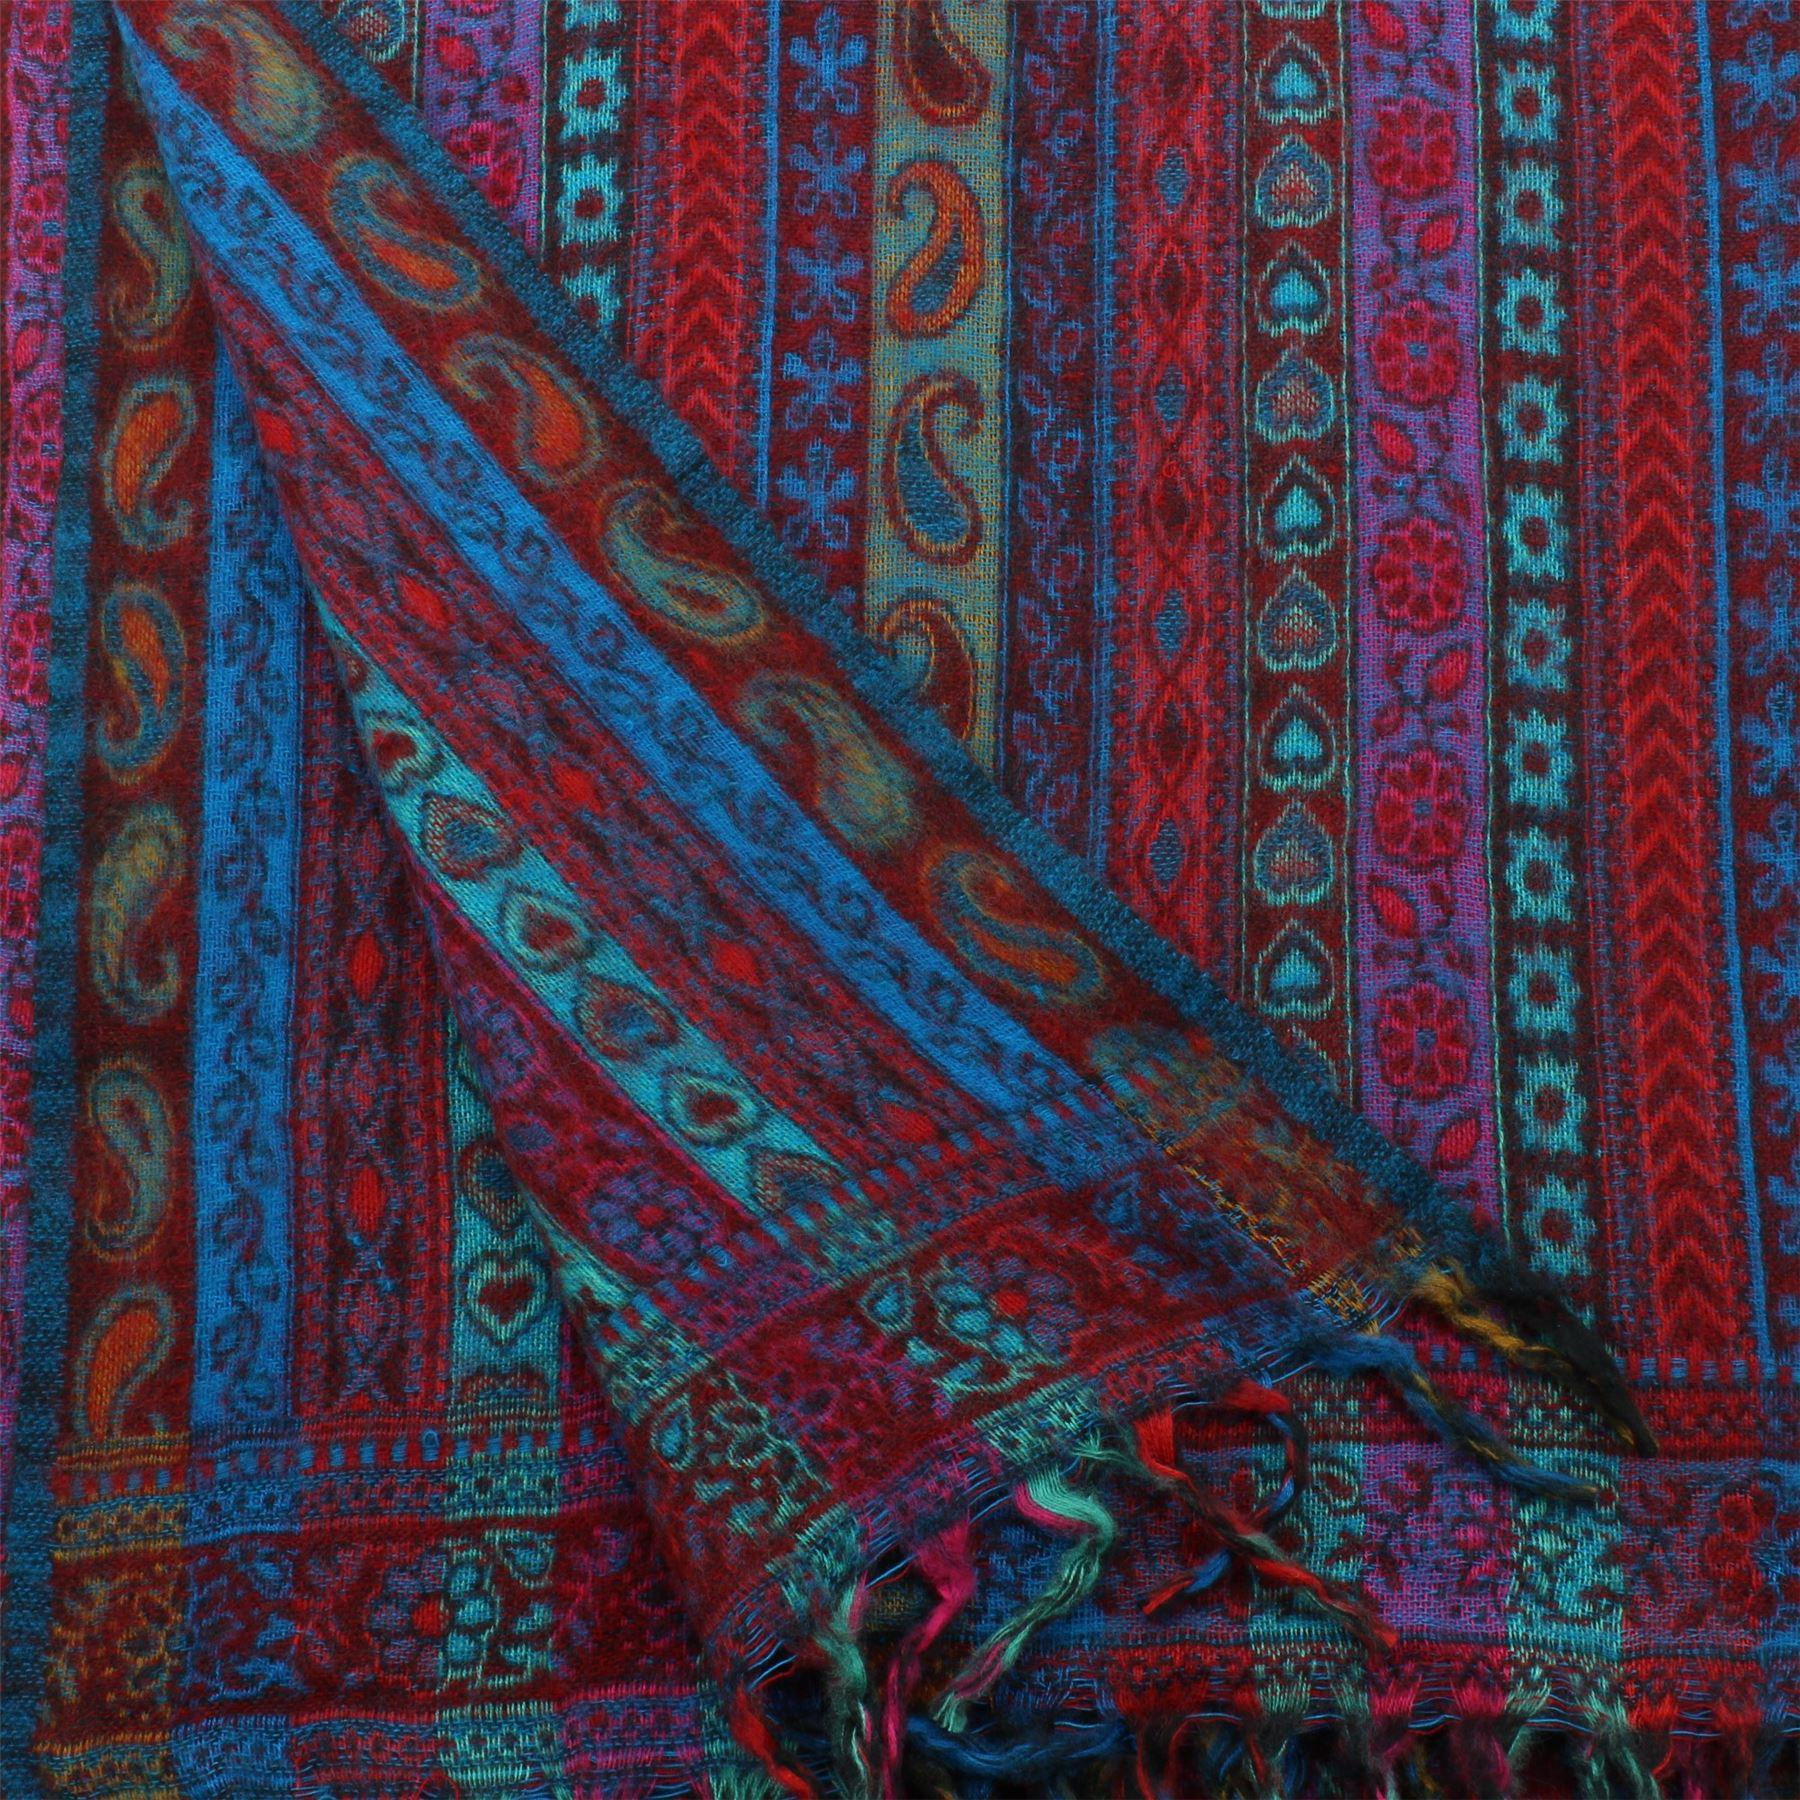 Acrylic-Wool-Blanket-Shawl-Wrap-Throw-Finest-Softest-India-Stripe-Paisley-Travel thumbnail 46